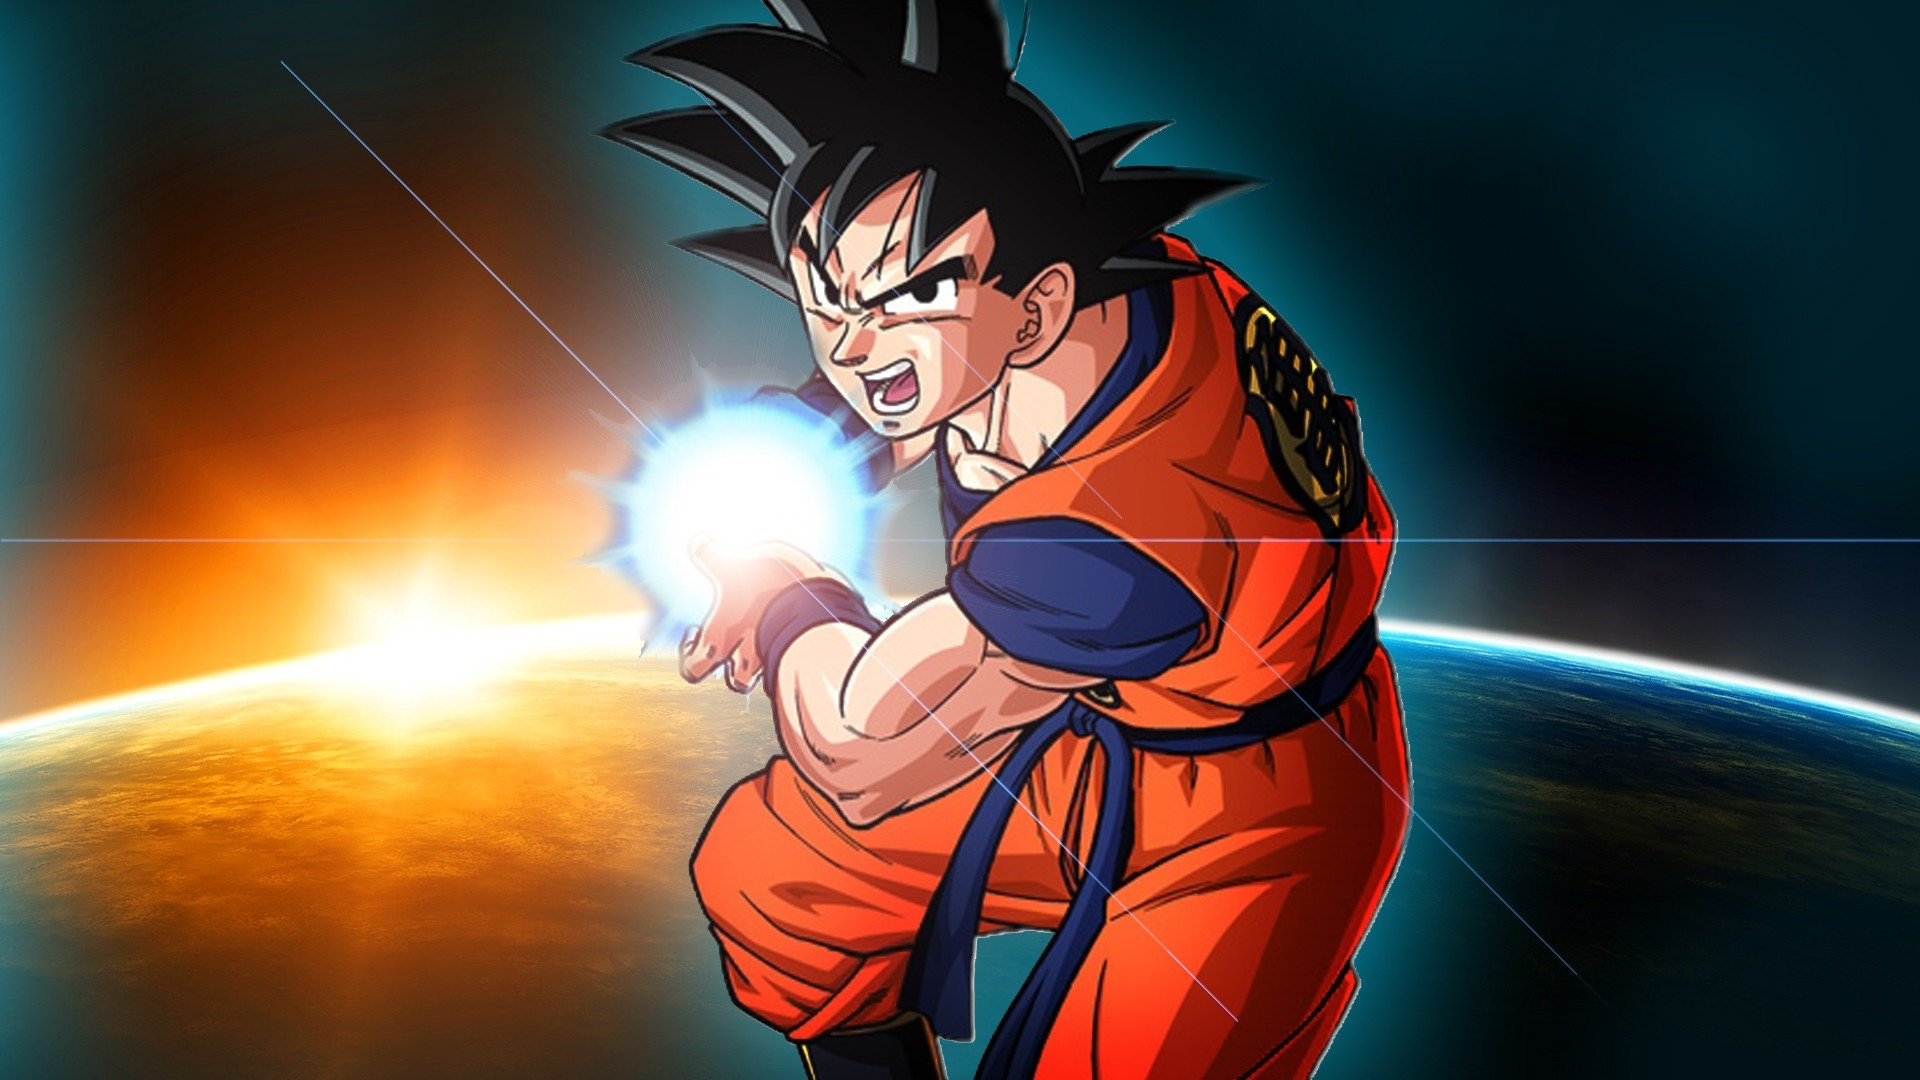 124 Dragon Ball Z Phone